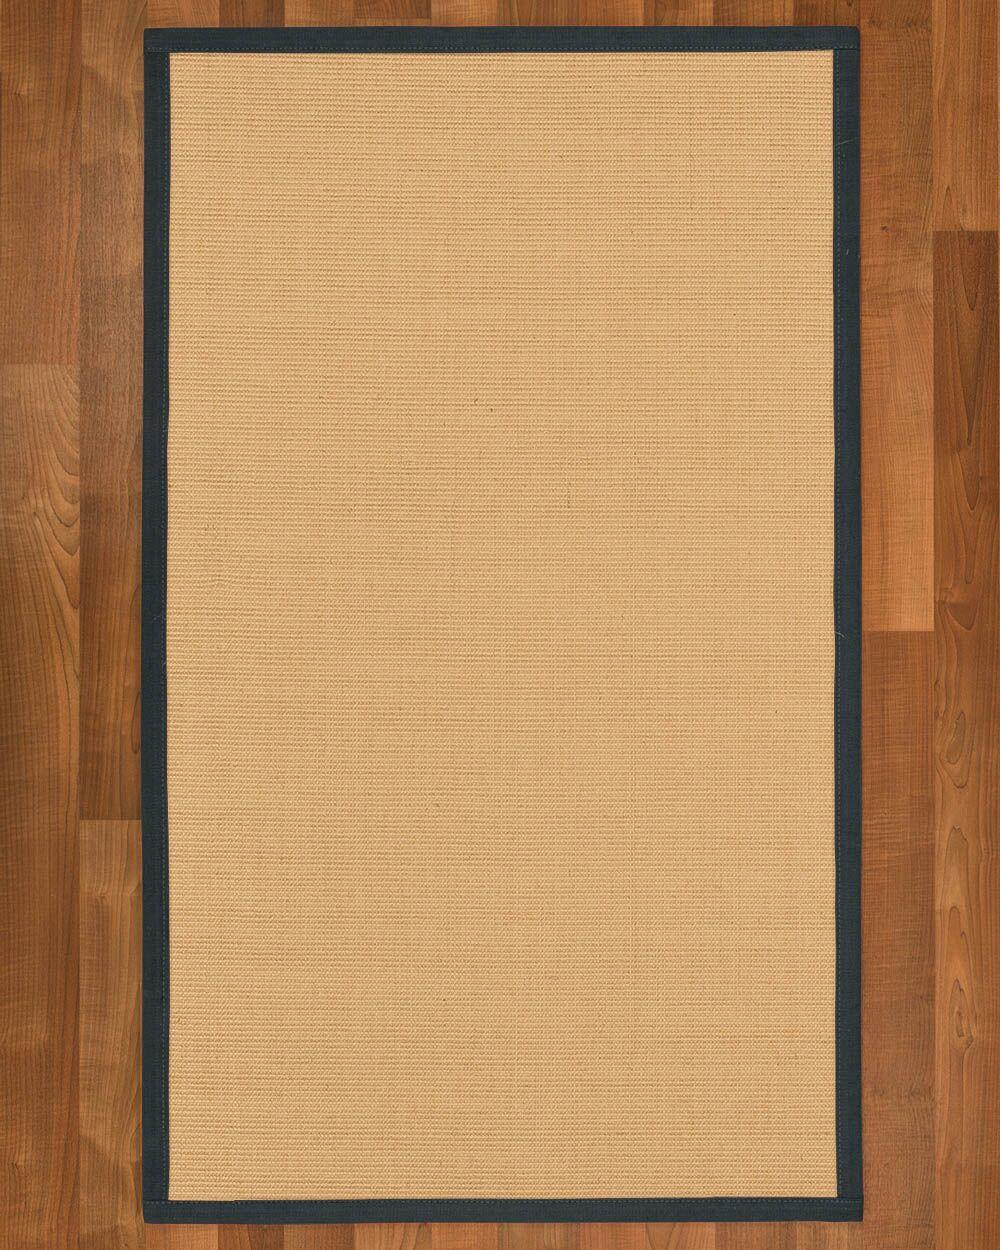 Rupendra Hand Woven Beige Area Rug Rug Size: Runner 2'6